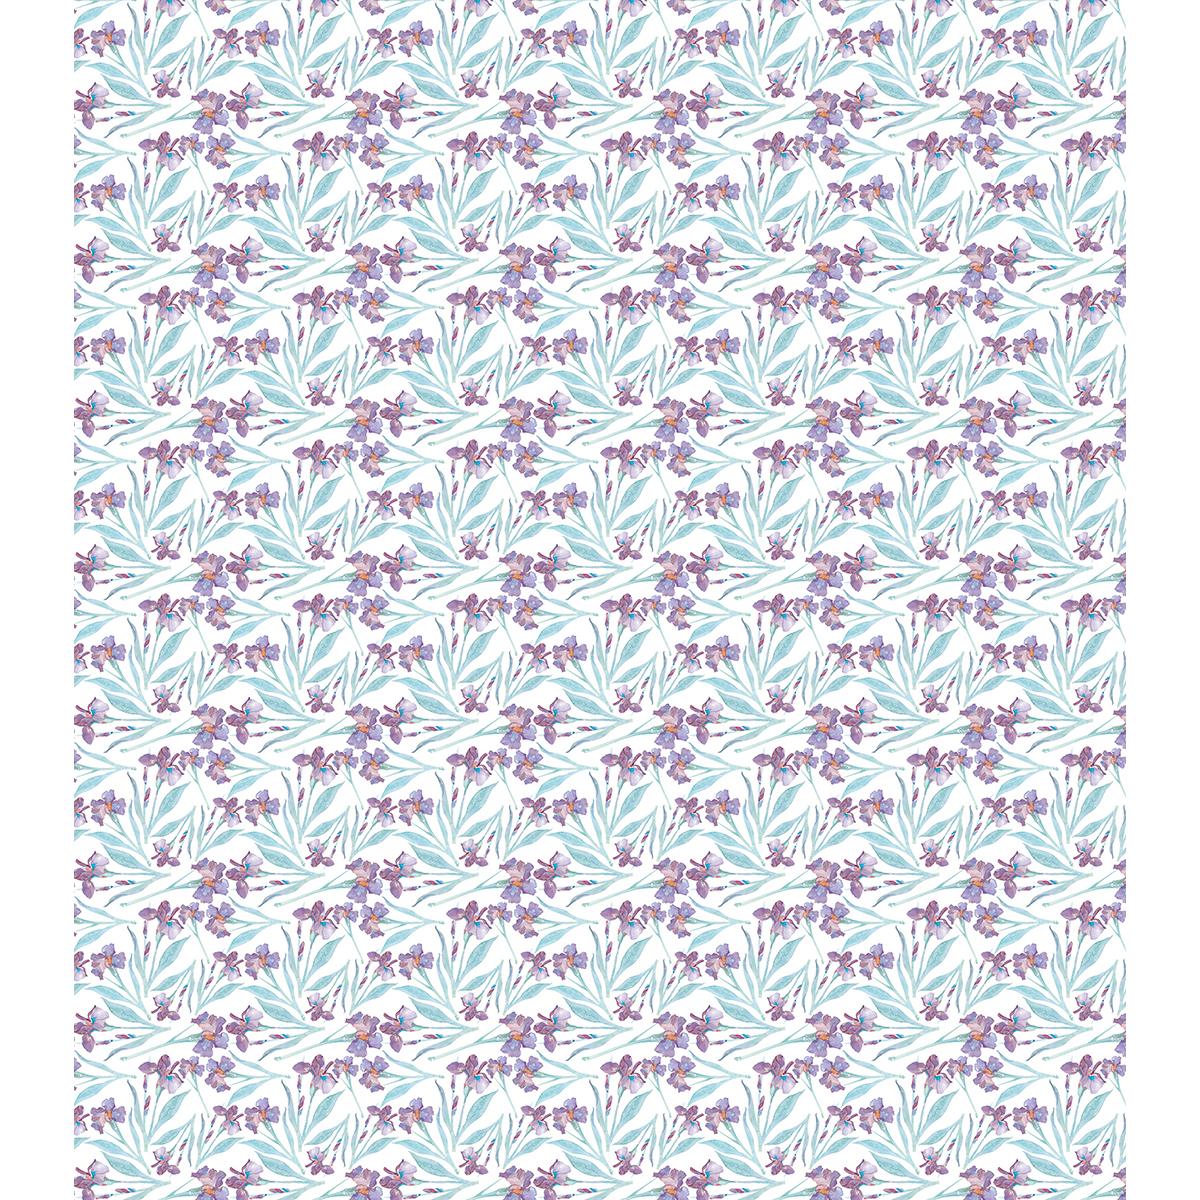 Deco Paper Violet Dafs